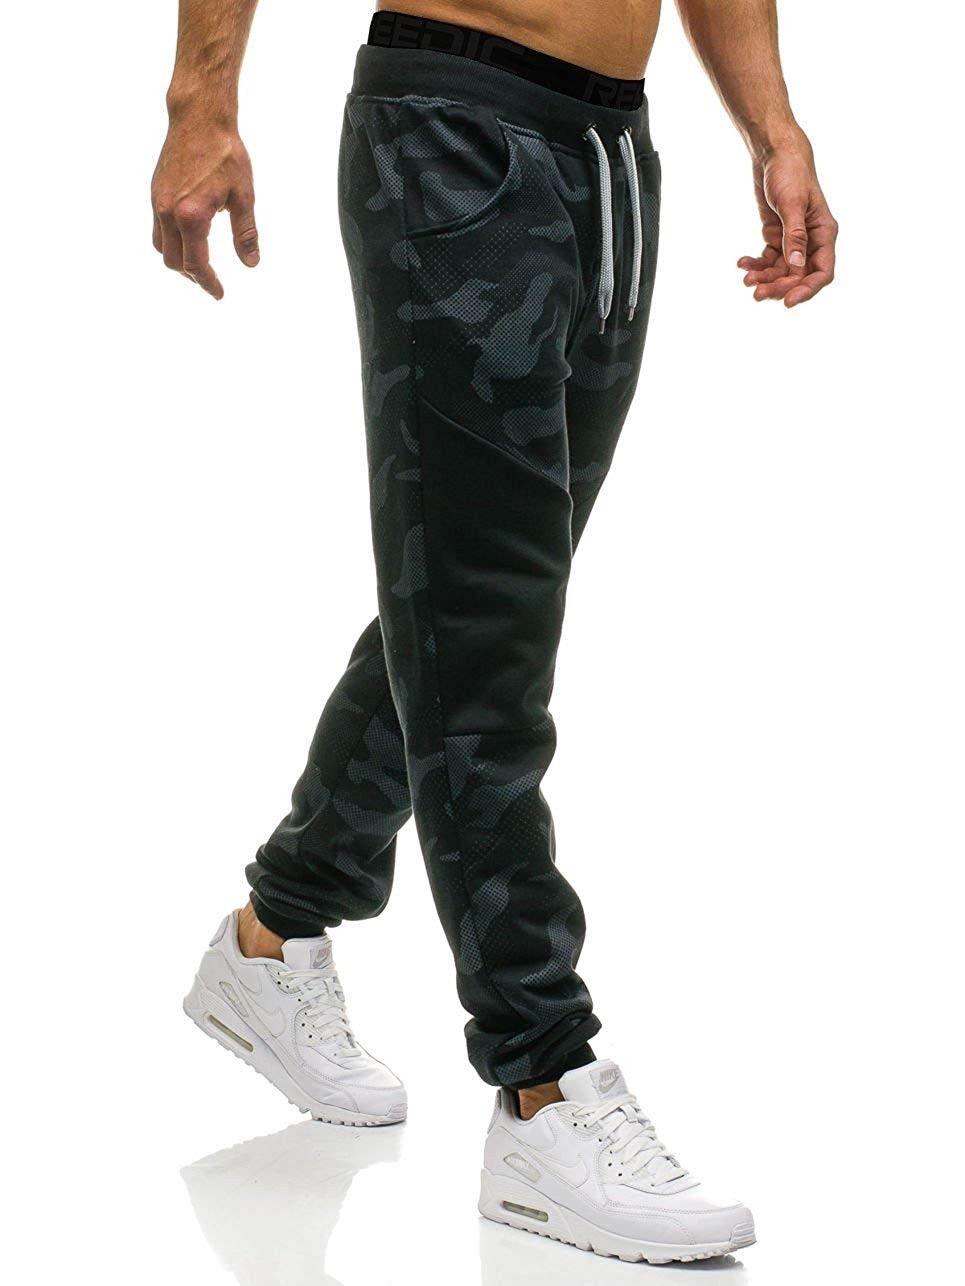 Men's Slim Fit Camo Jogger Sweatpant Cotton Tapered Gym